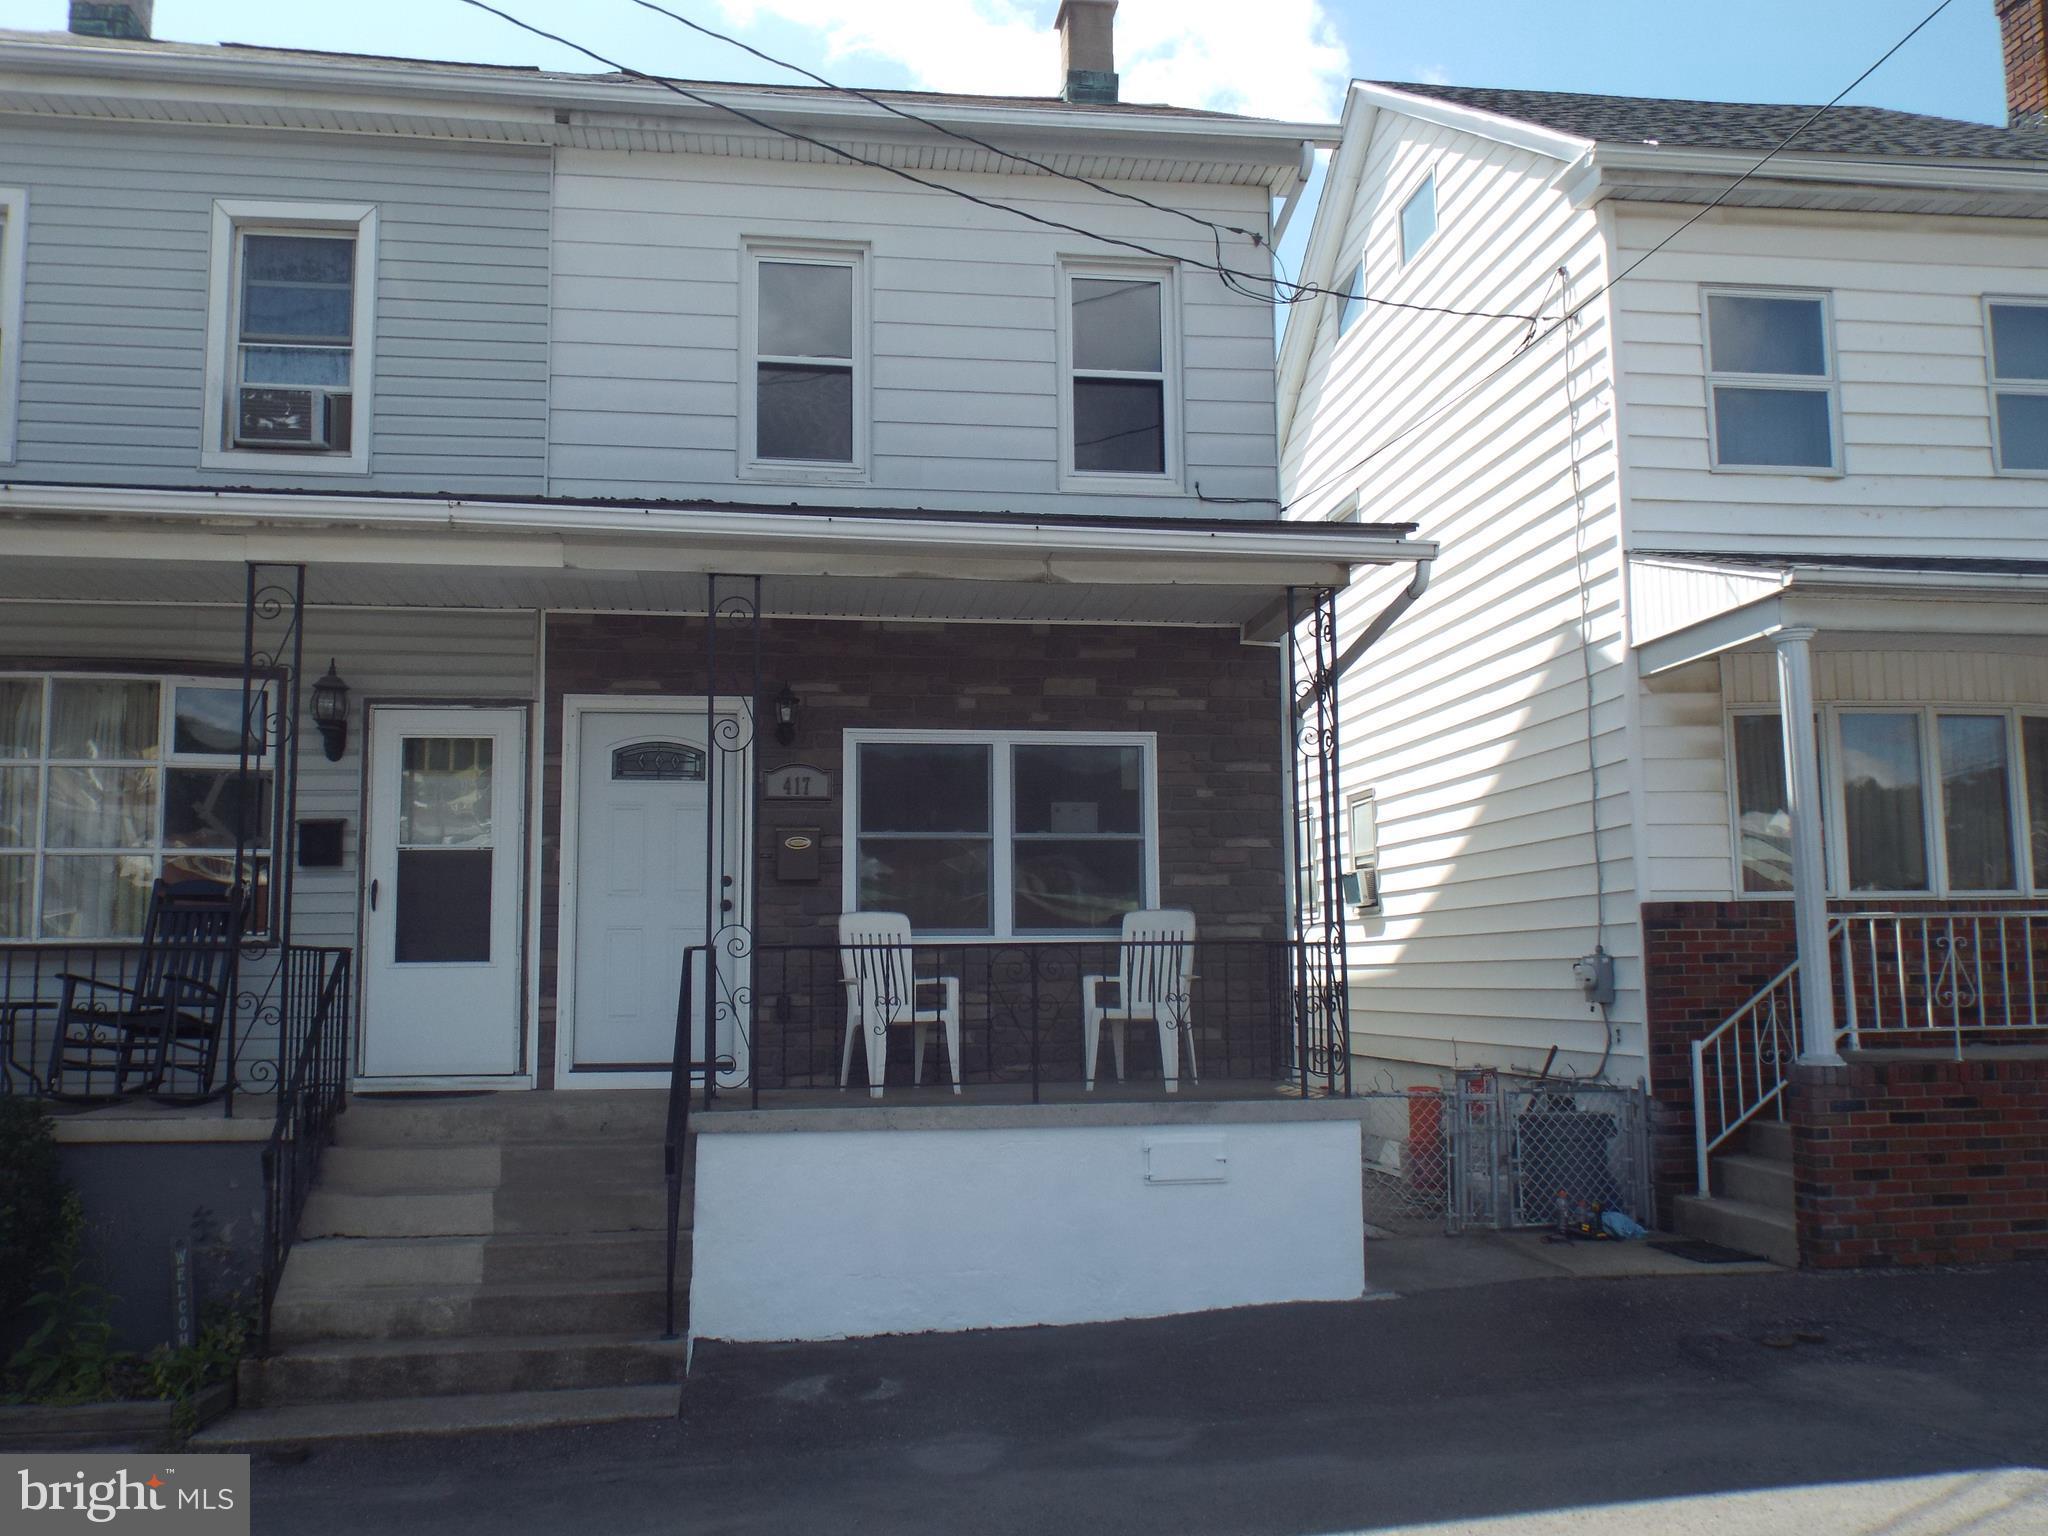 417 PINE STREET, MINERSVILLE, PA 17954